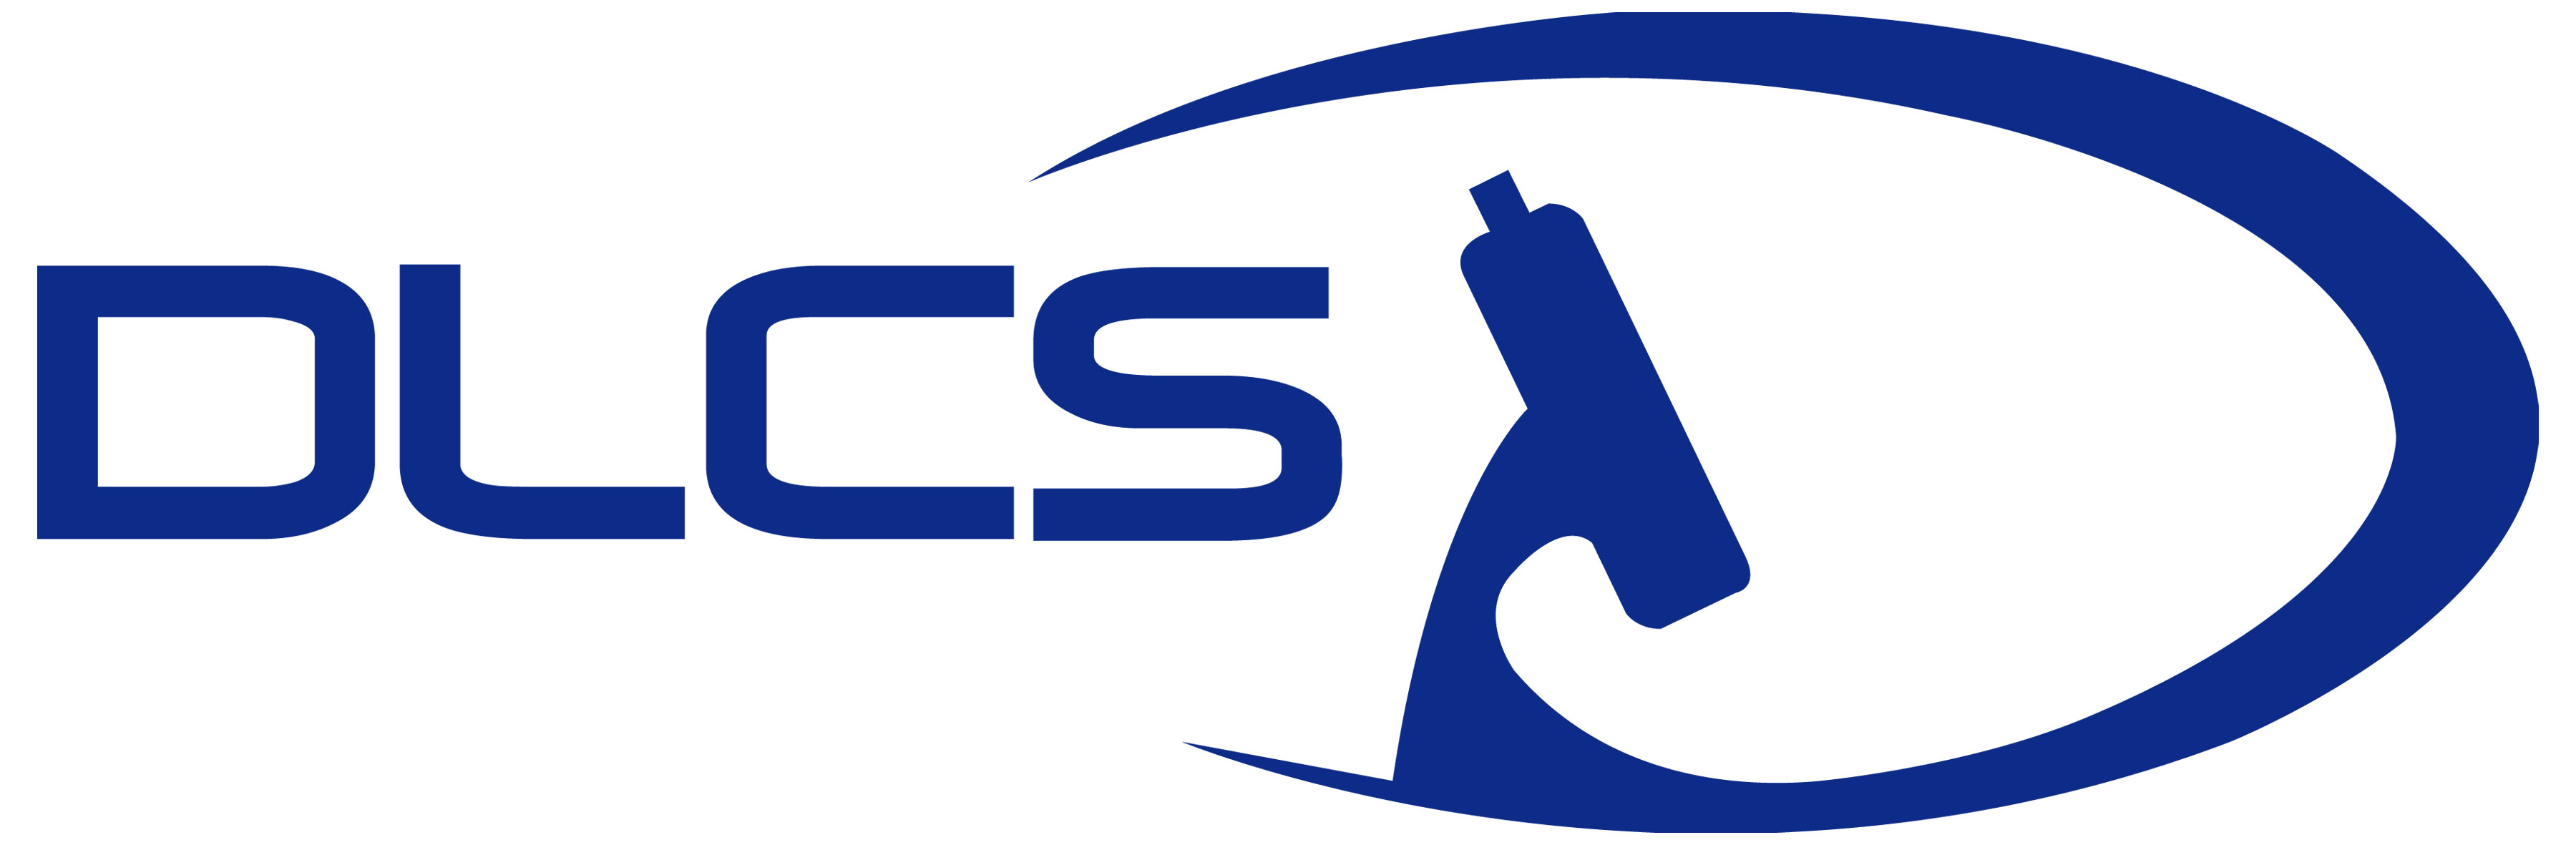 Laboratory Logo : www.galleryhip.com - The Hippest Pics